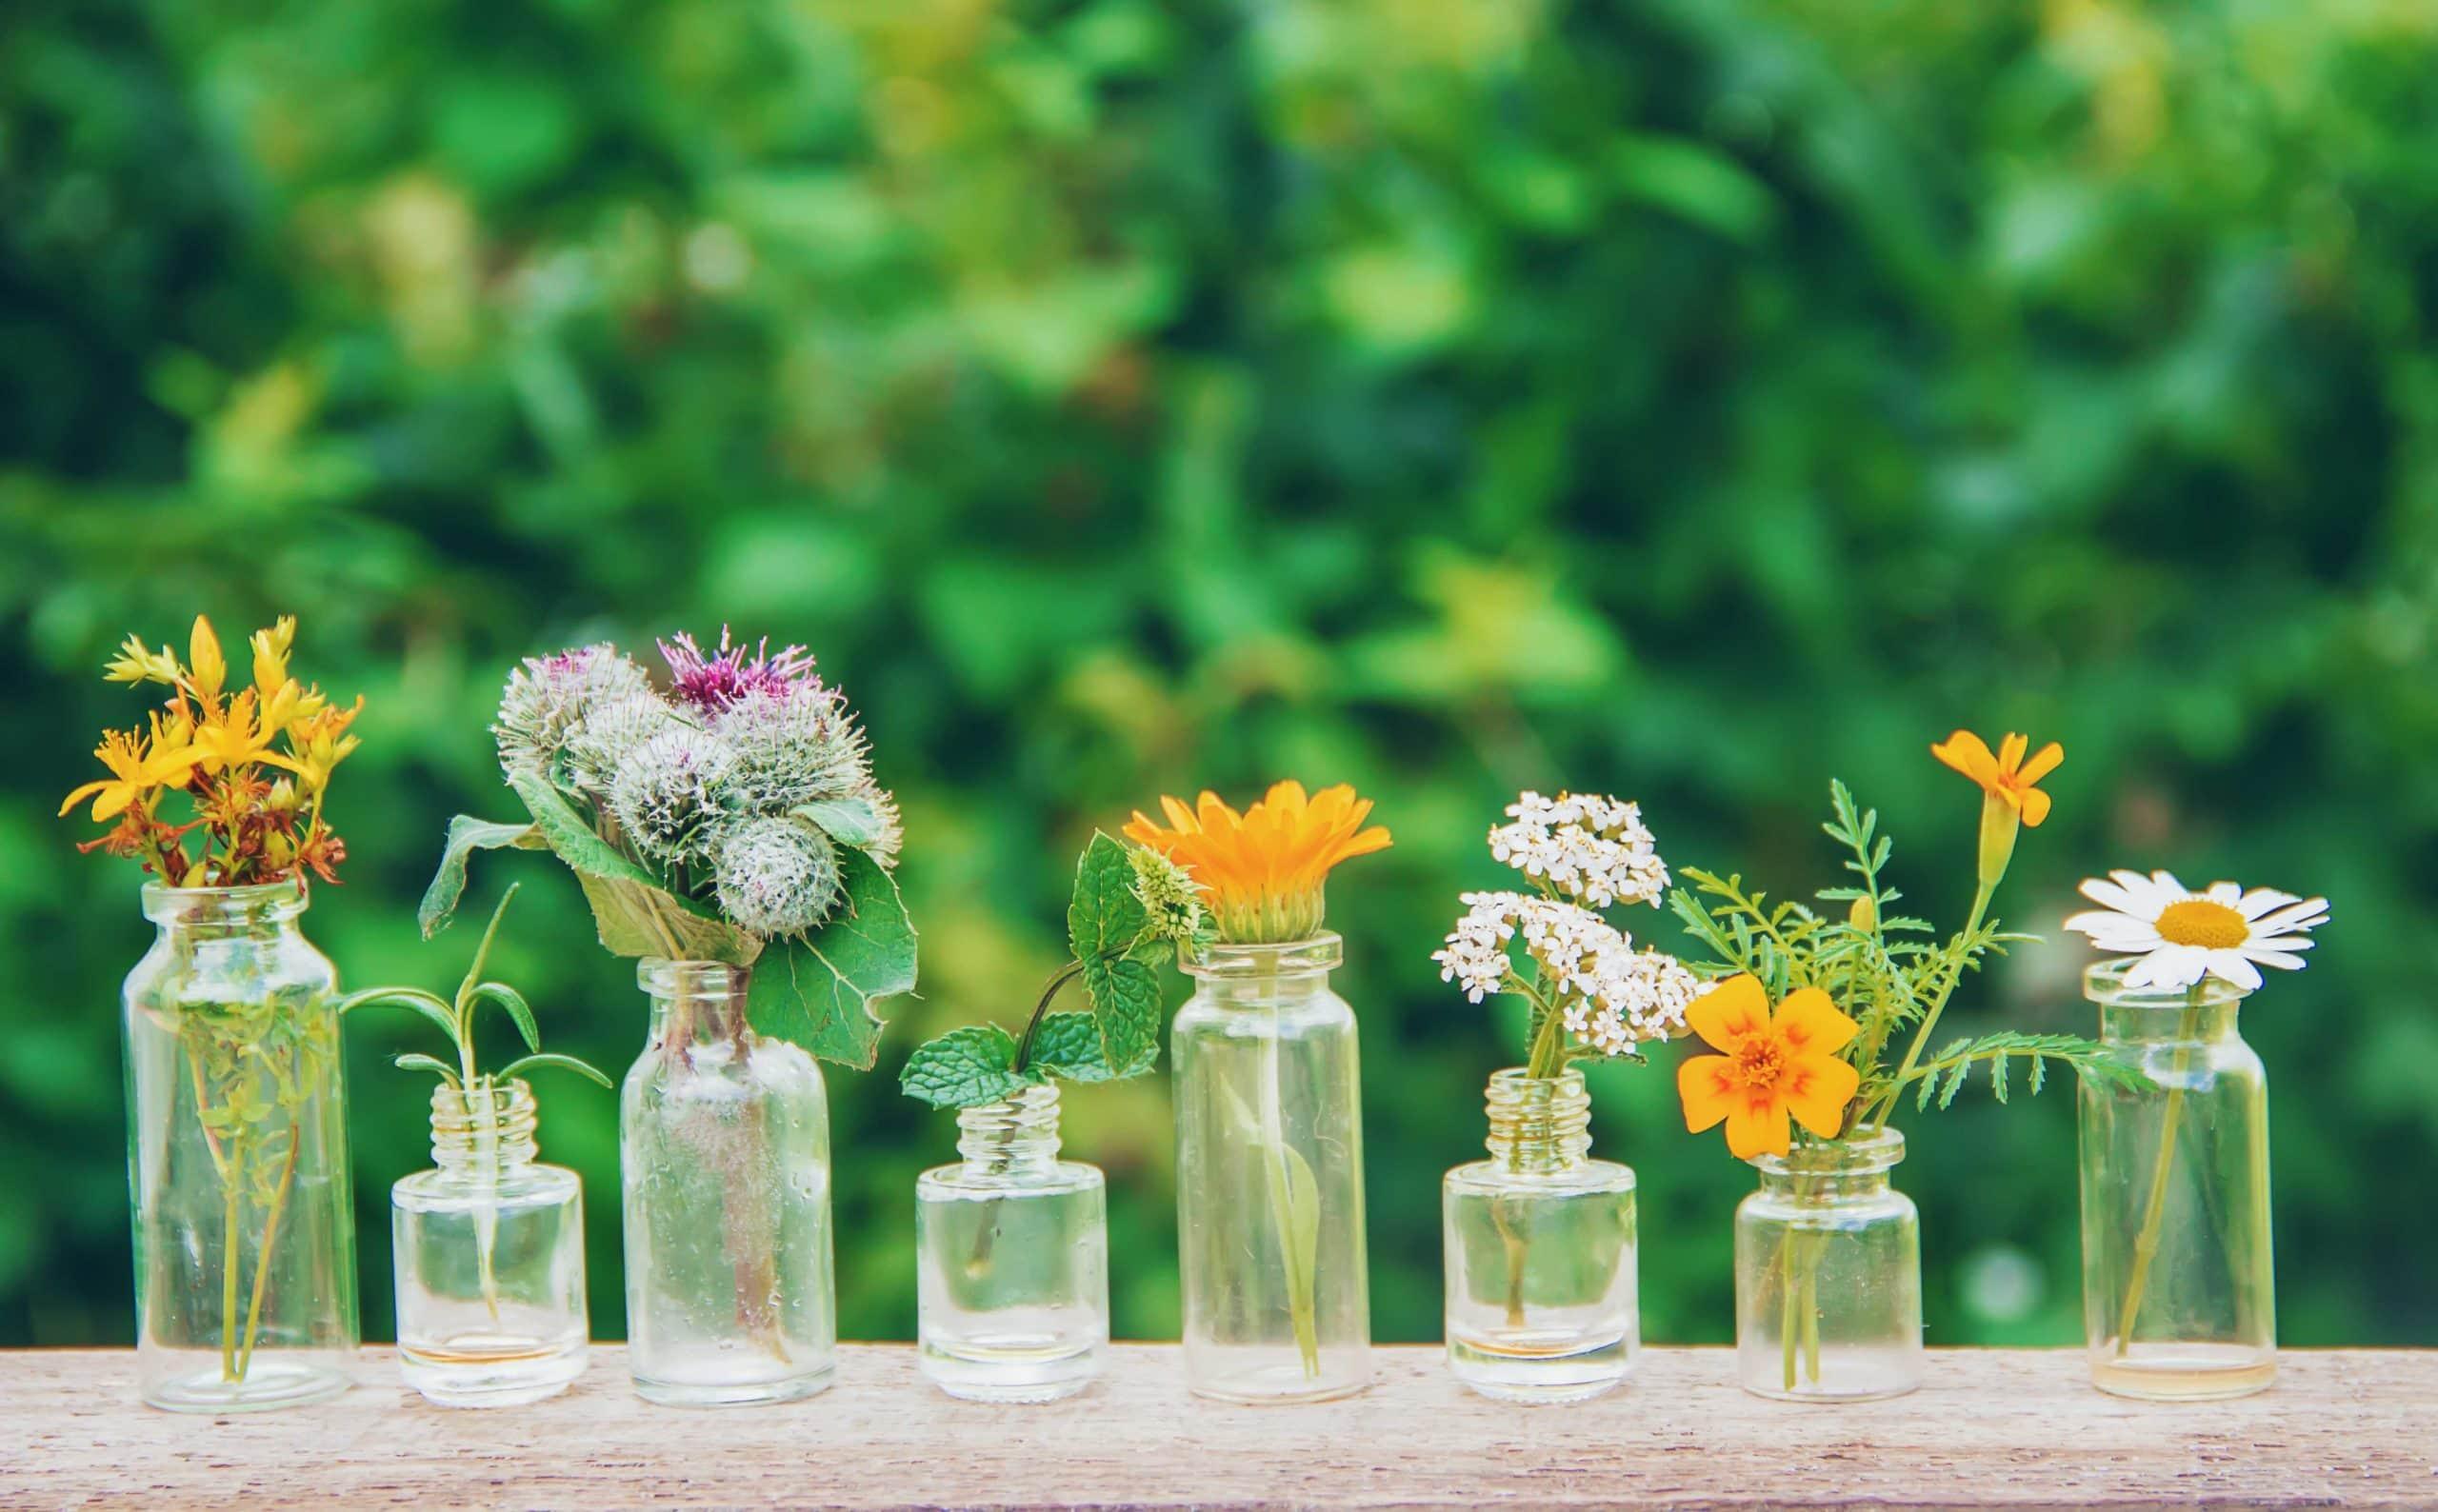 row of single plant bottles